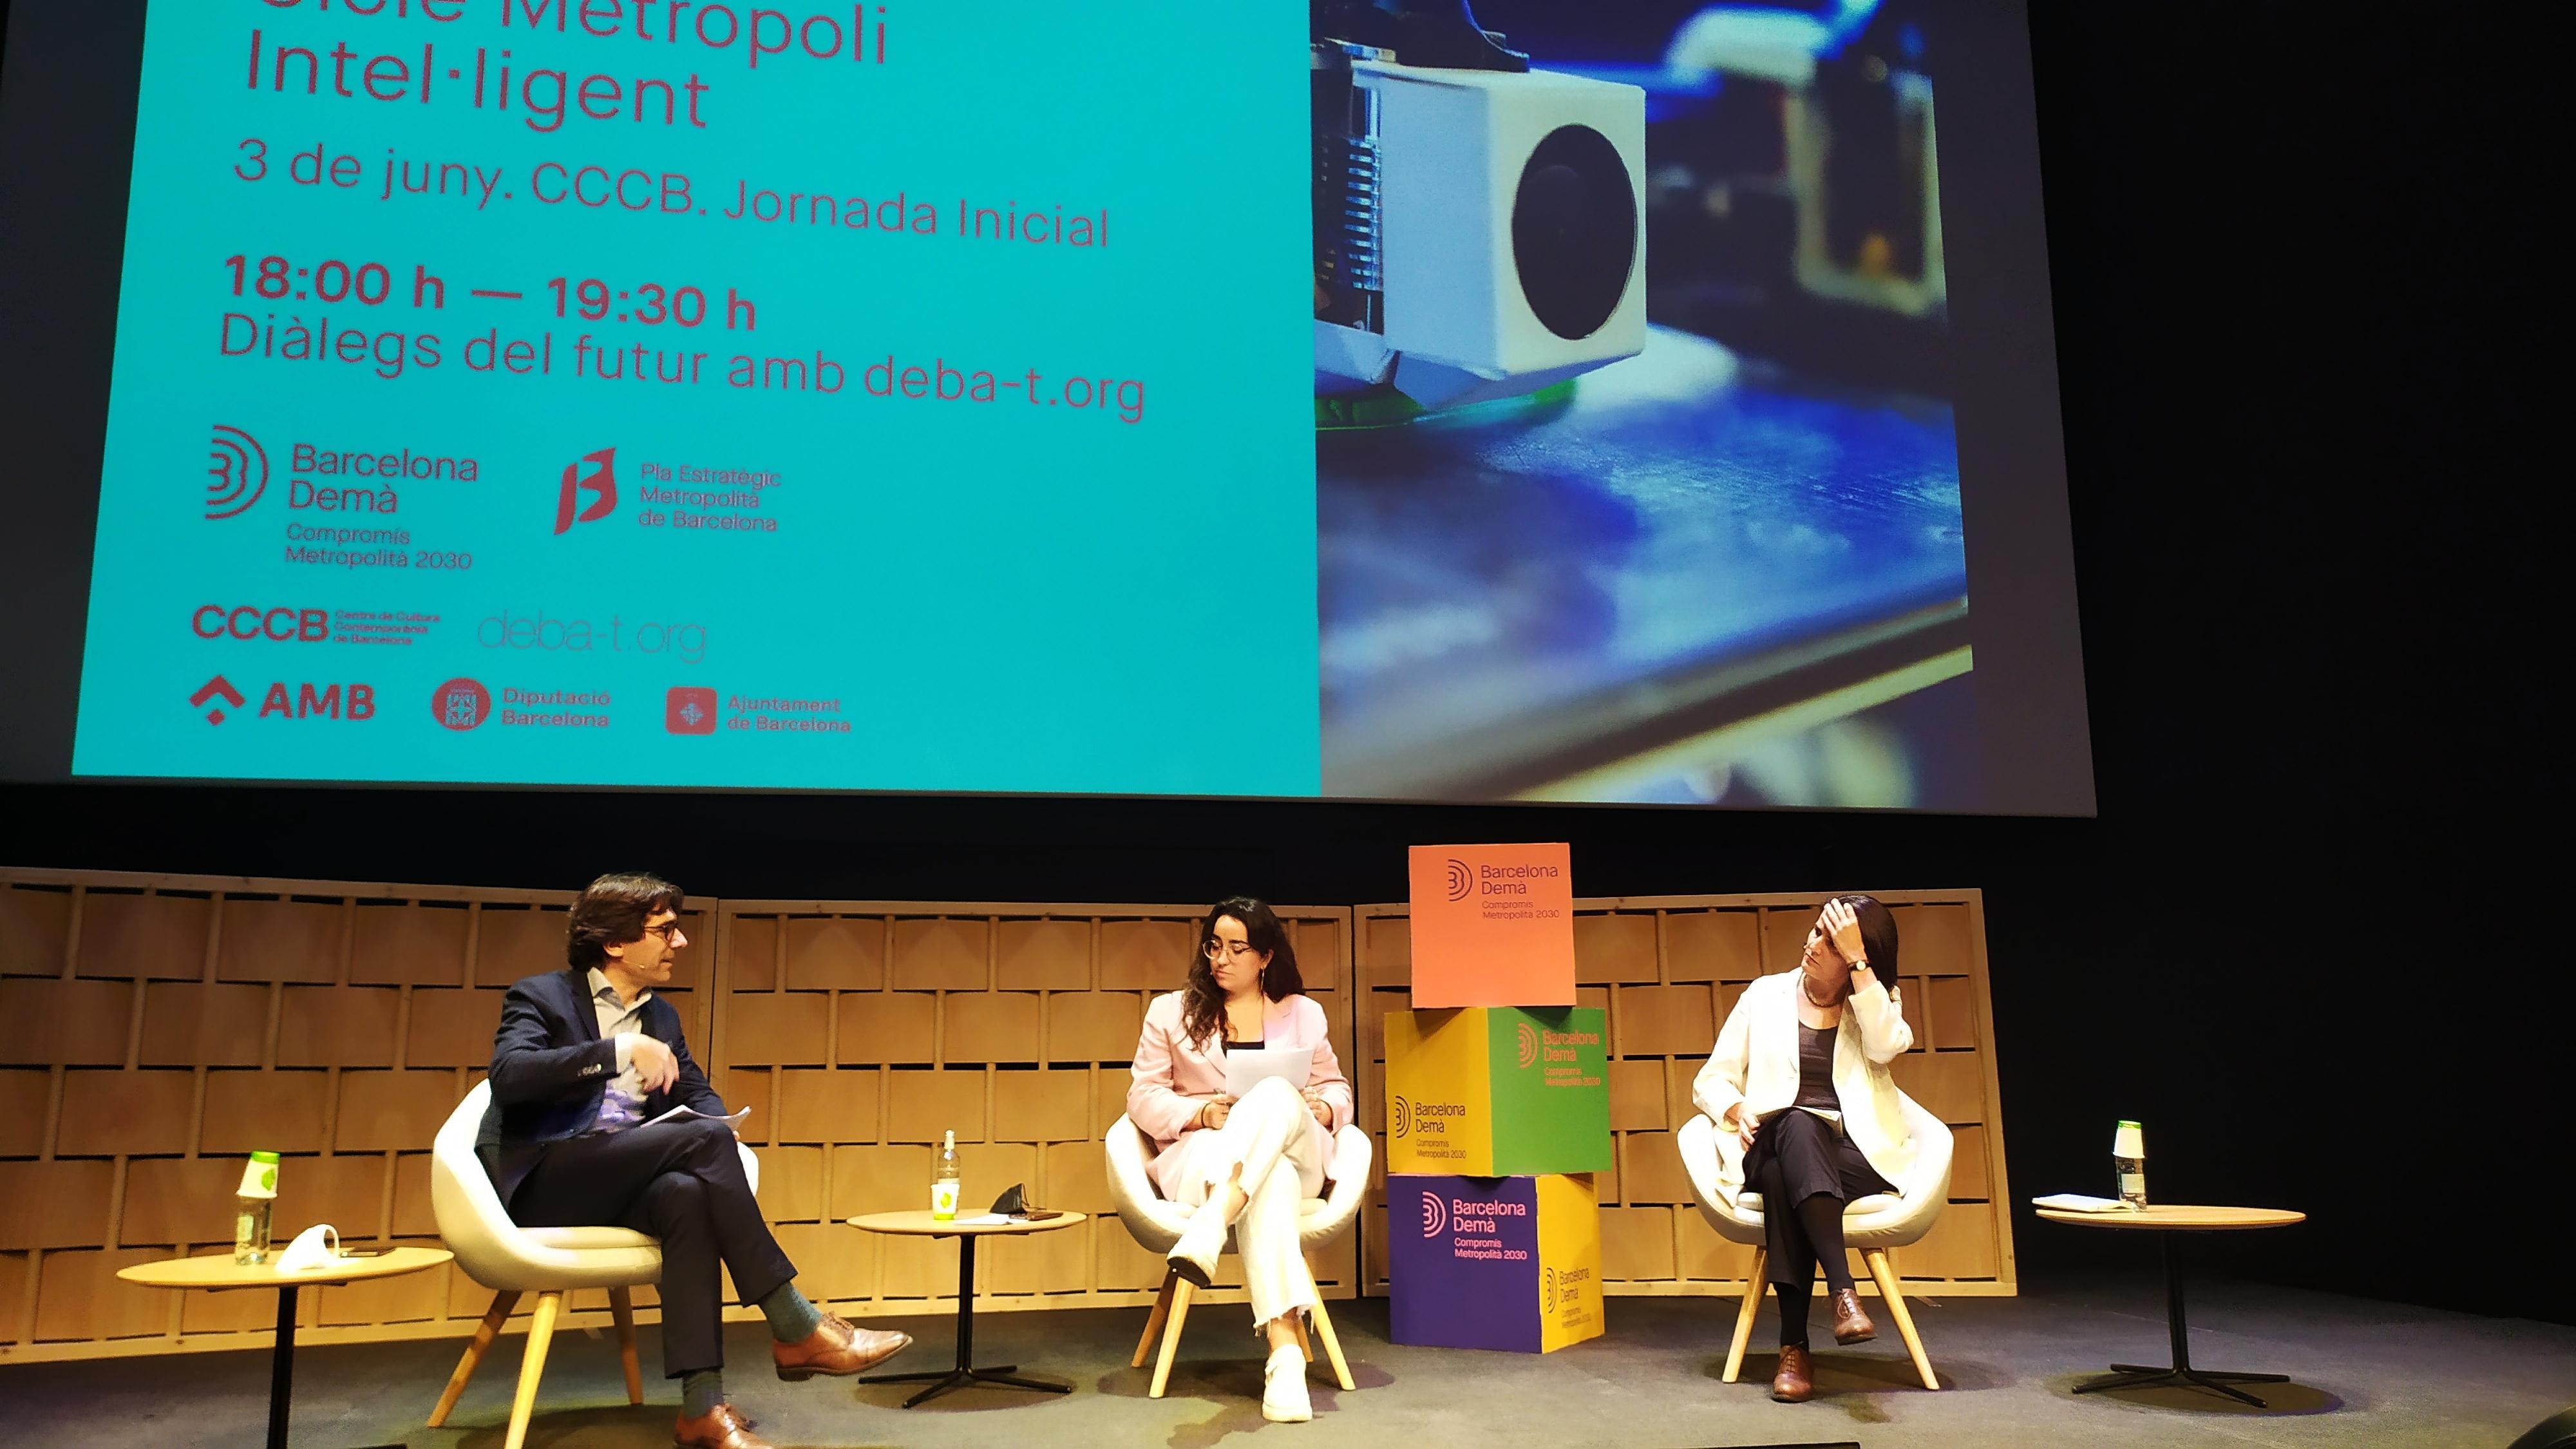 Mesa 4: Diálogos de futuro: ¿Que querrá decir vivir en una Metrópoli Inteligente 2030? con Deba-t.org